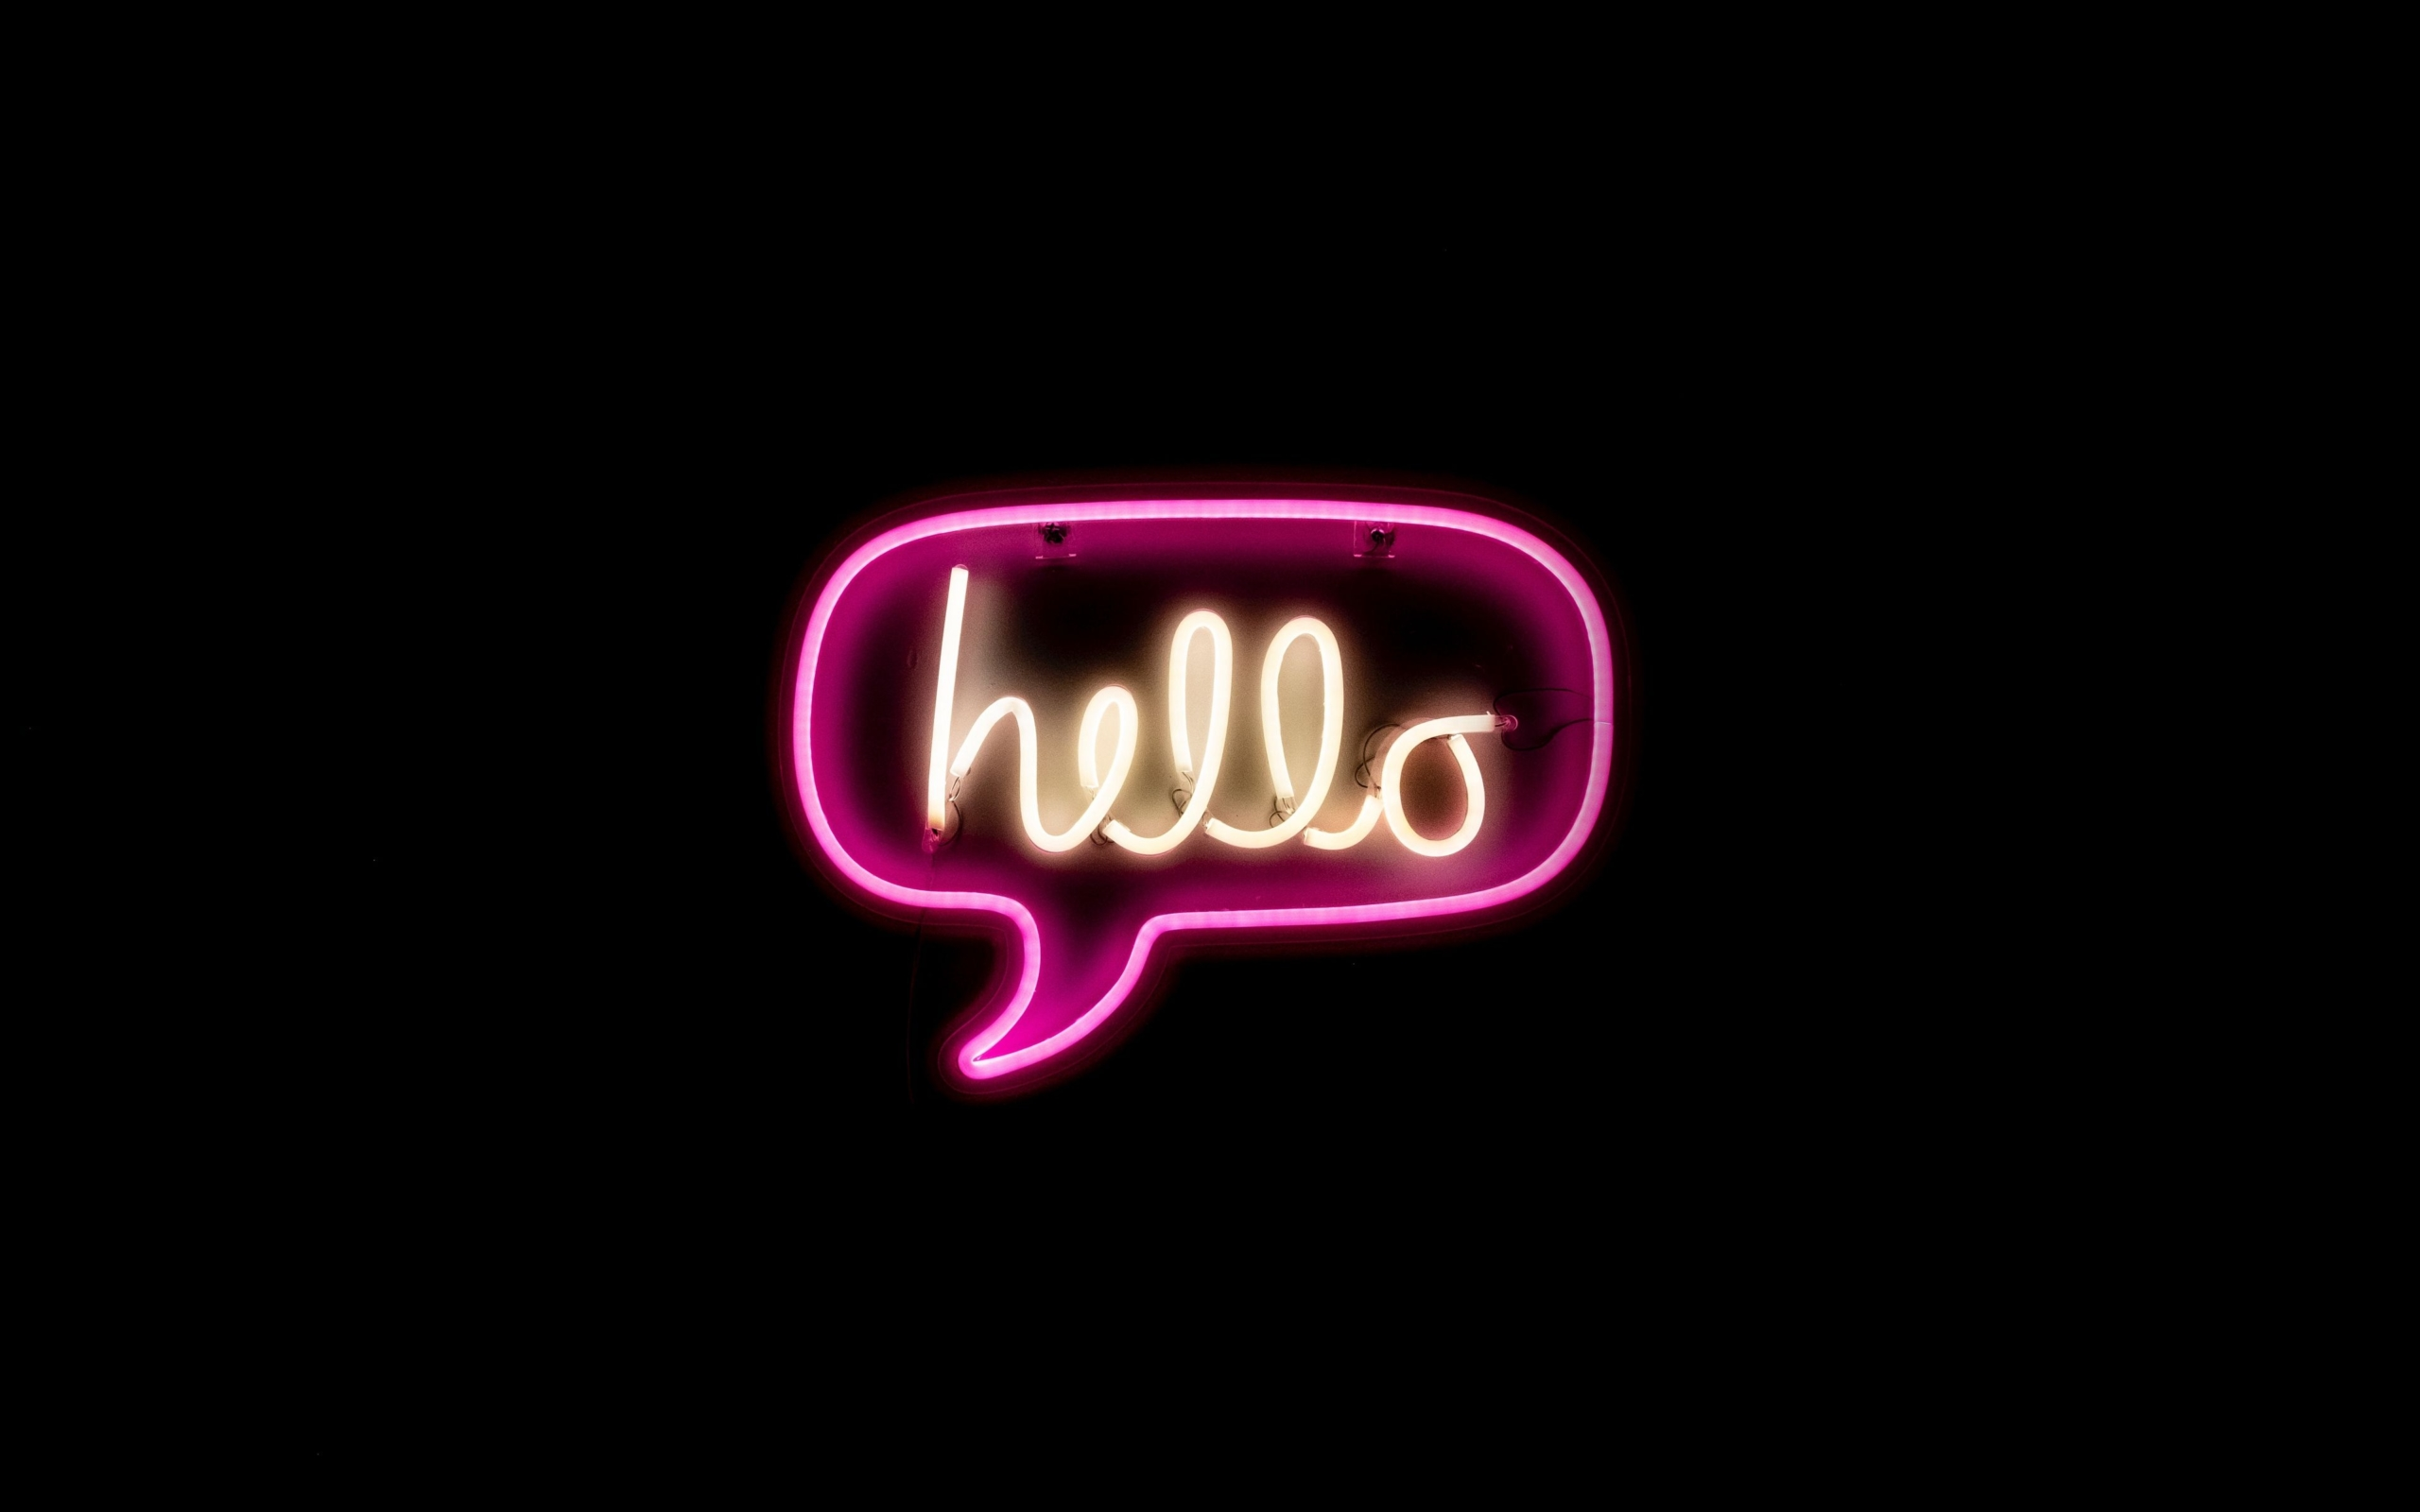 hello wallpaper design ideas for your computer